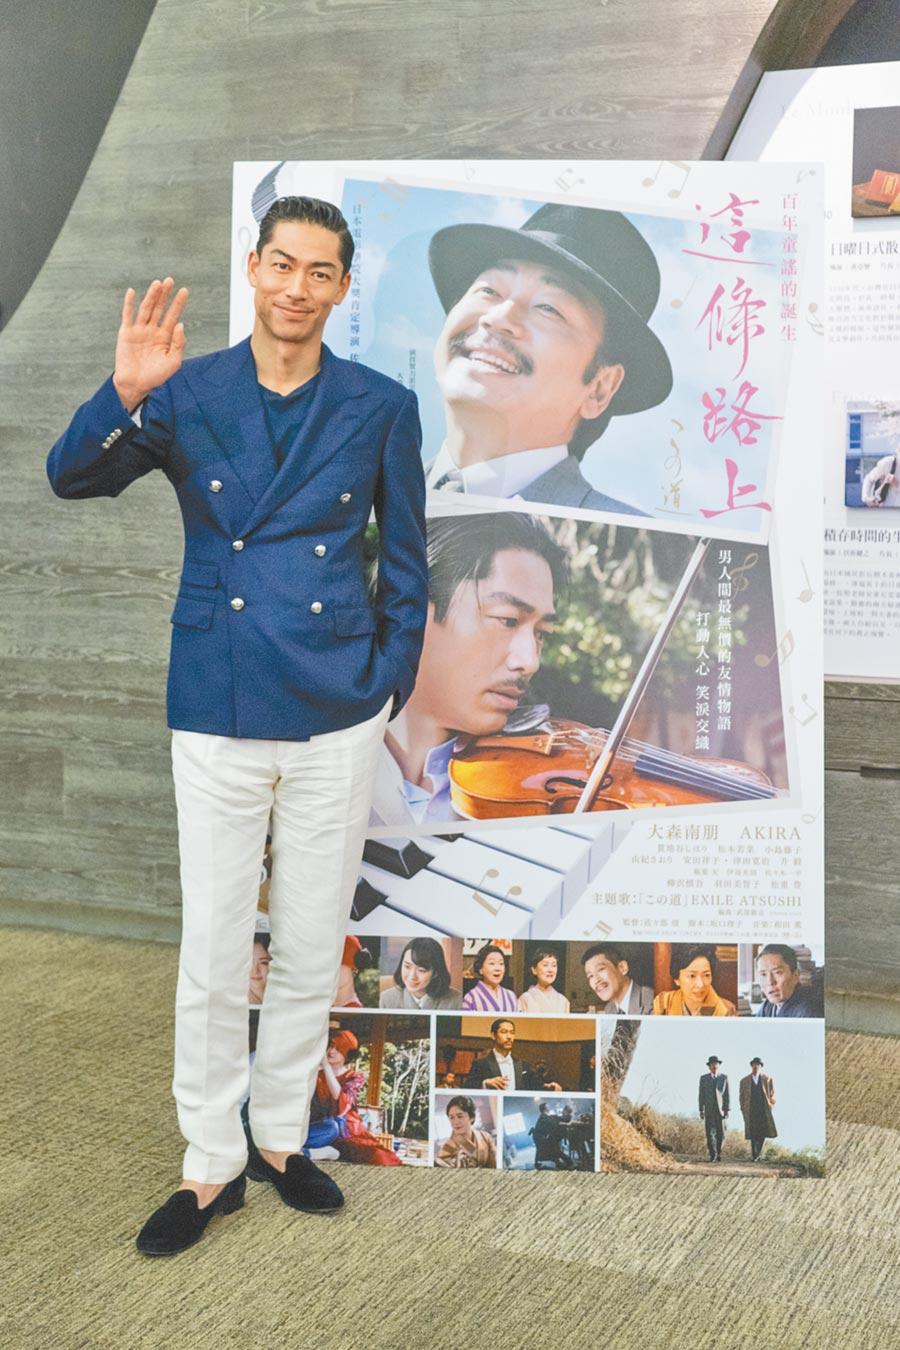 AKIRA表示為演出山田耕筰,前期做了不少功課。